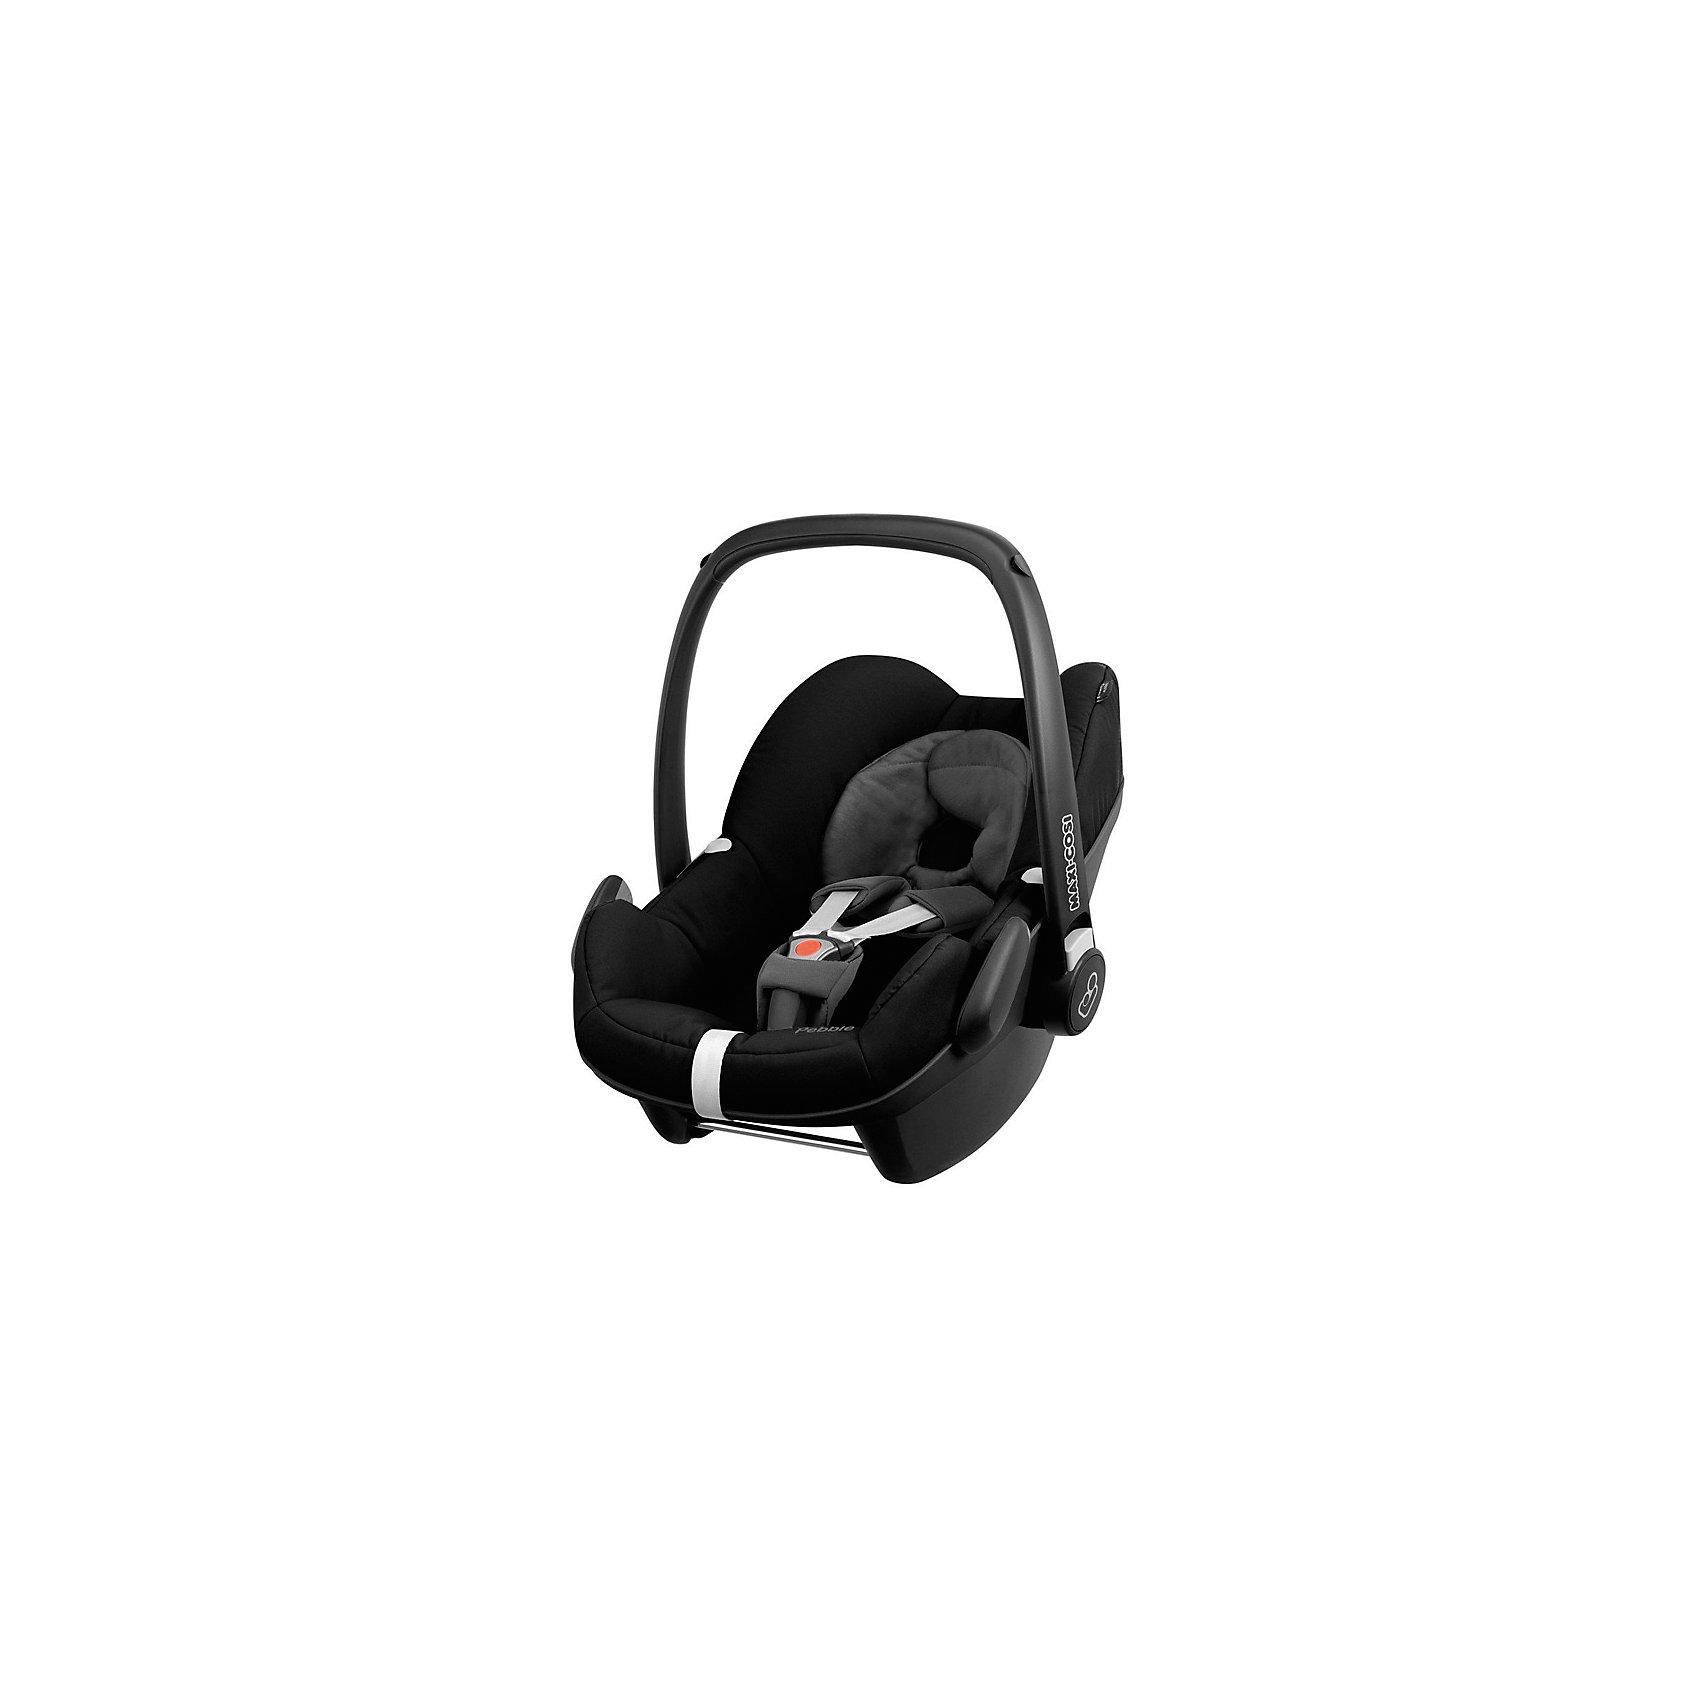 Maxi Cosi Автокресло Maxi-Cosi Pebble 0-13 кг, Black Devotion